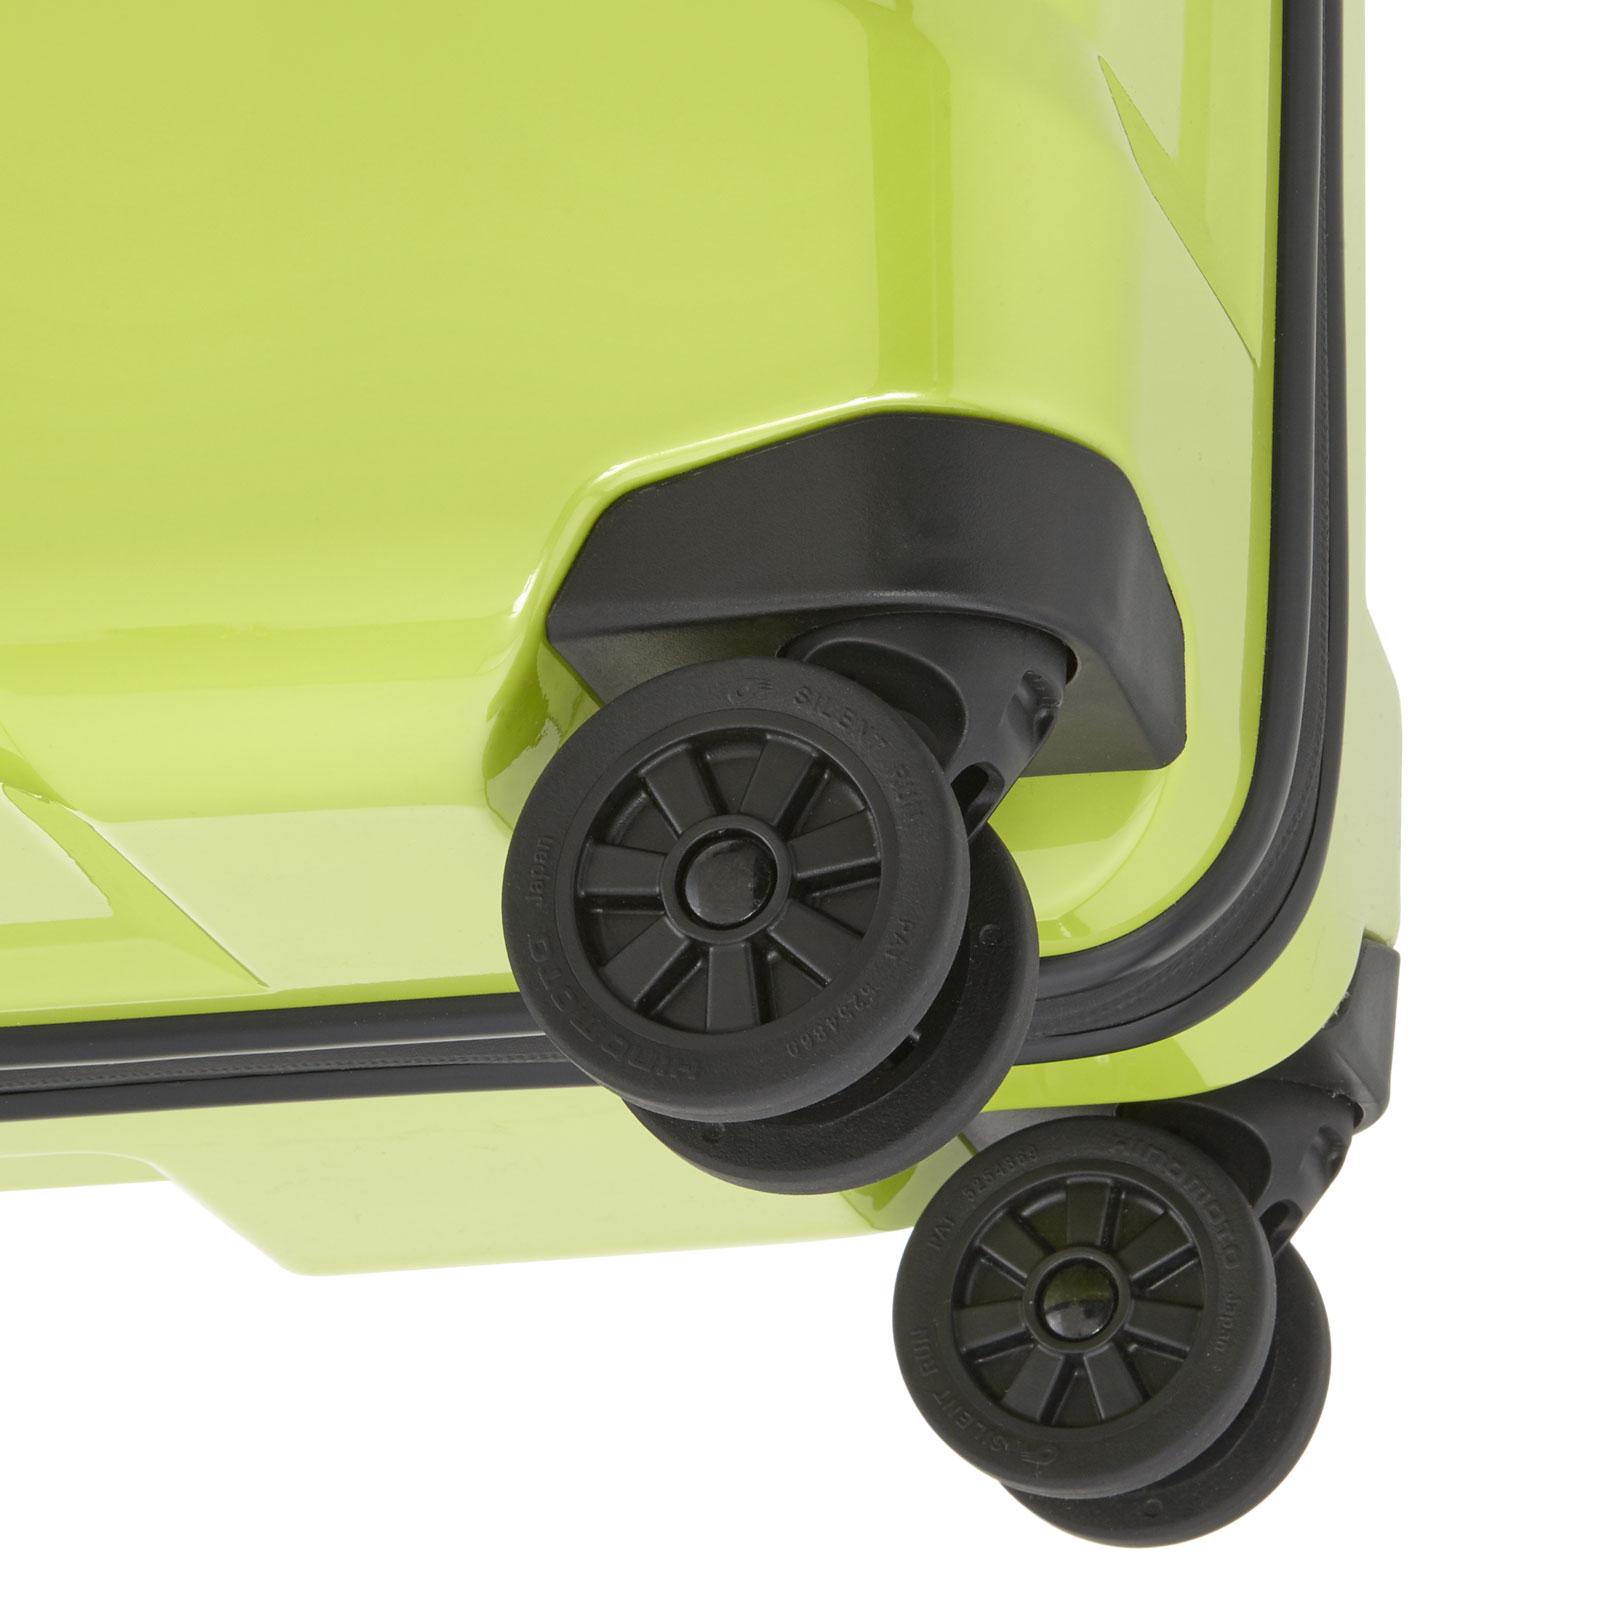 titan x2 modell 2017 trolley mittel g nstig kaufen. Black Bedroom Furniture Sets. Home Design Ideas